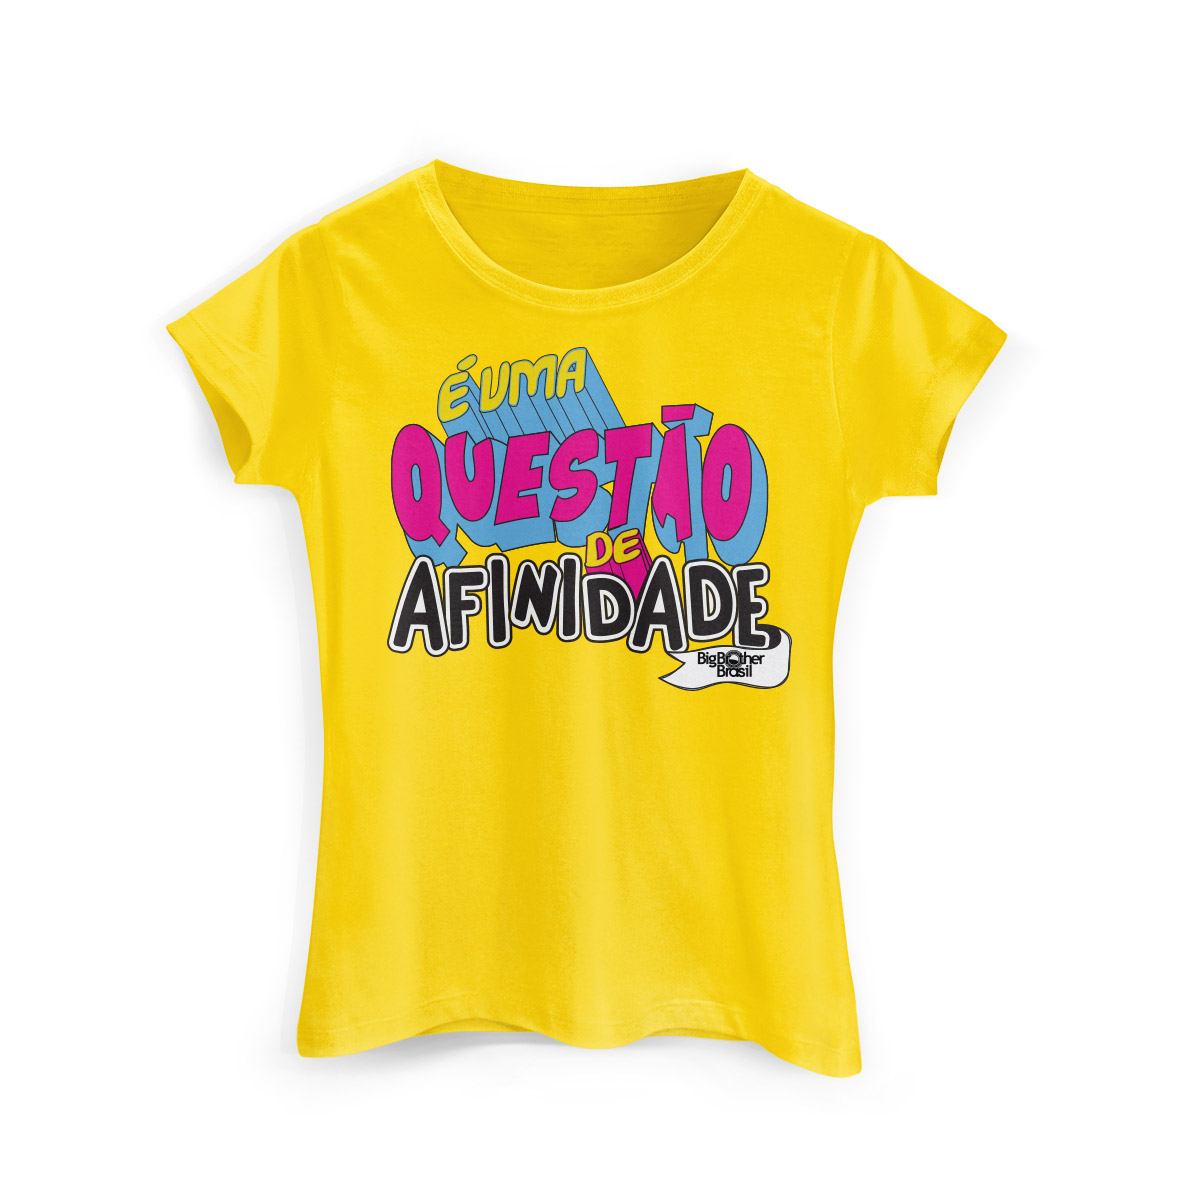 Camiseta Feminina Big Brother Brasil 15 Afinidade Modelo 2